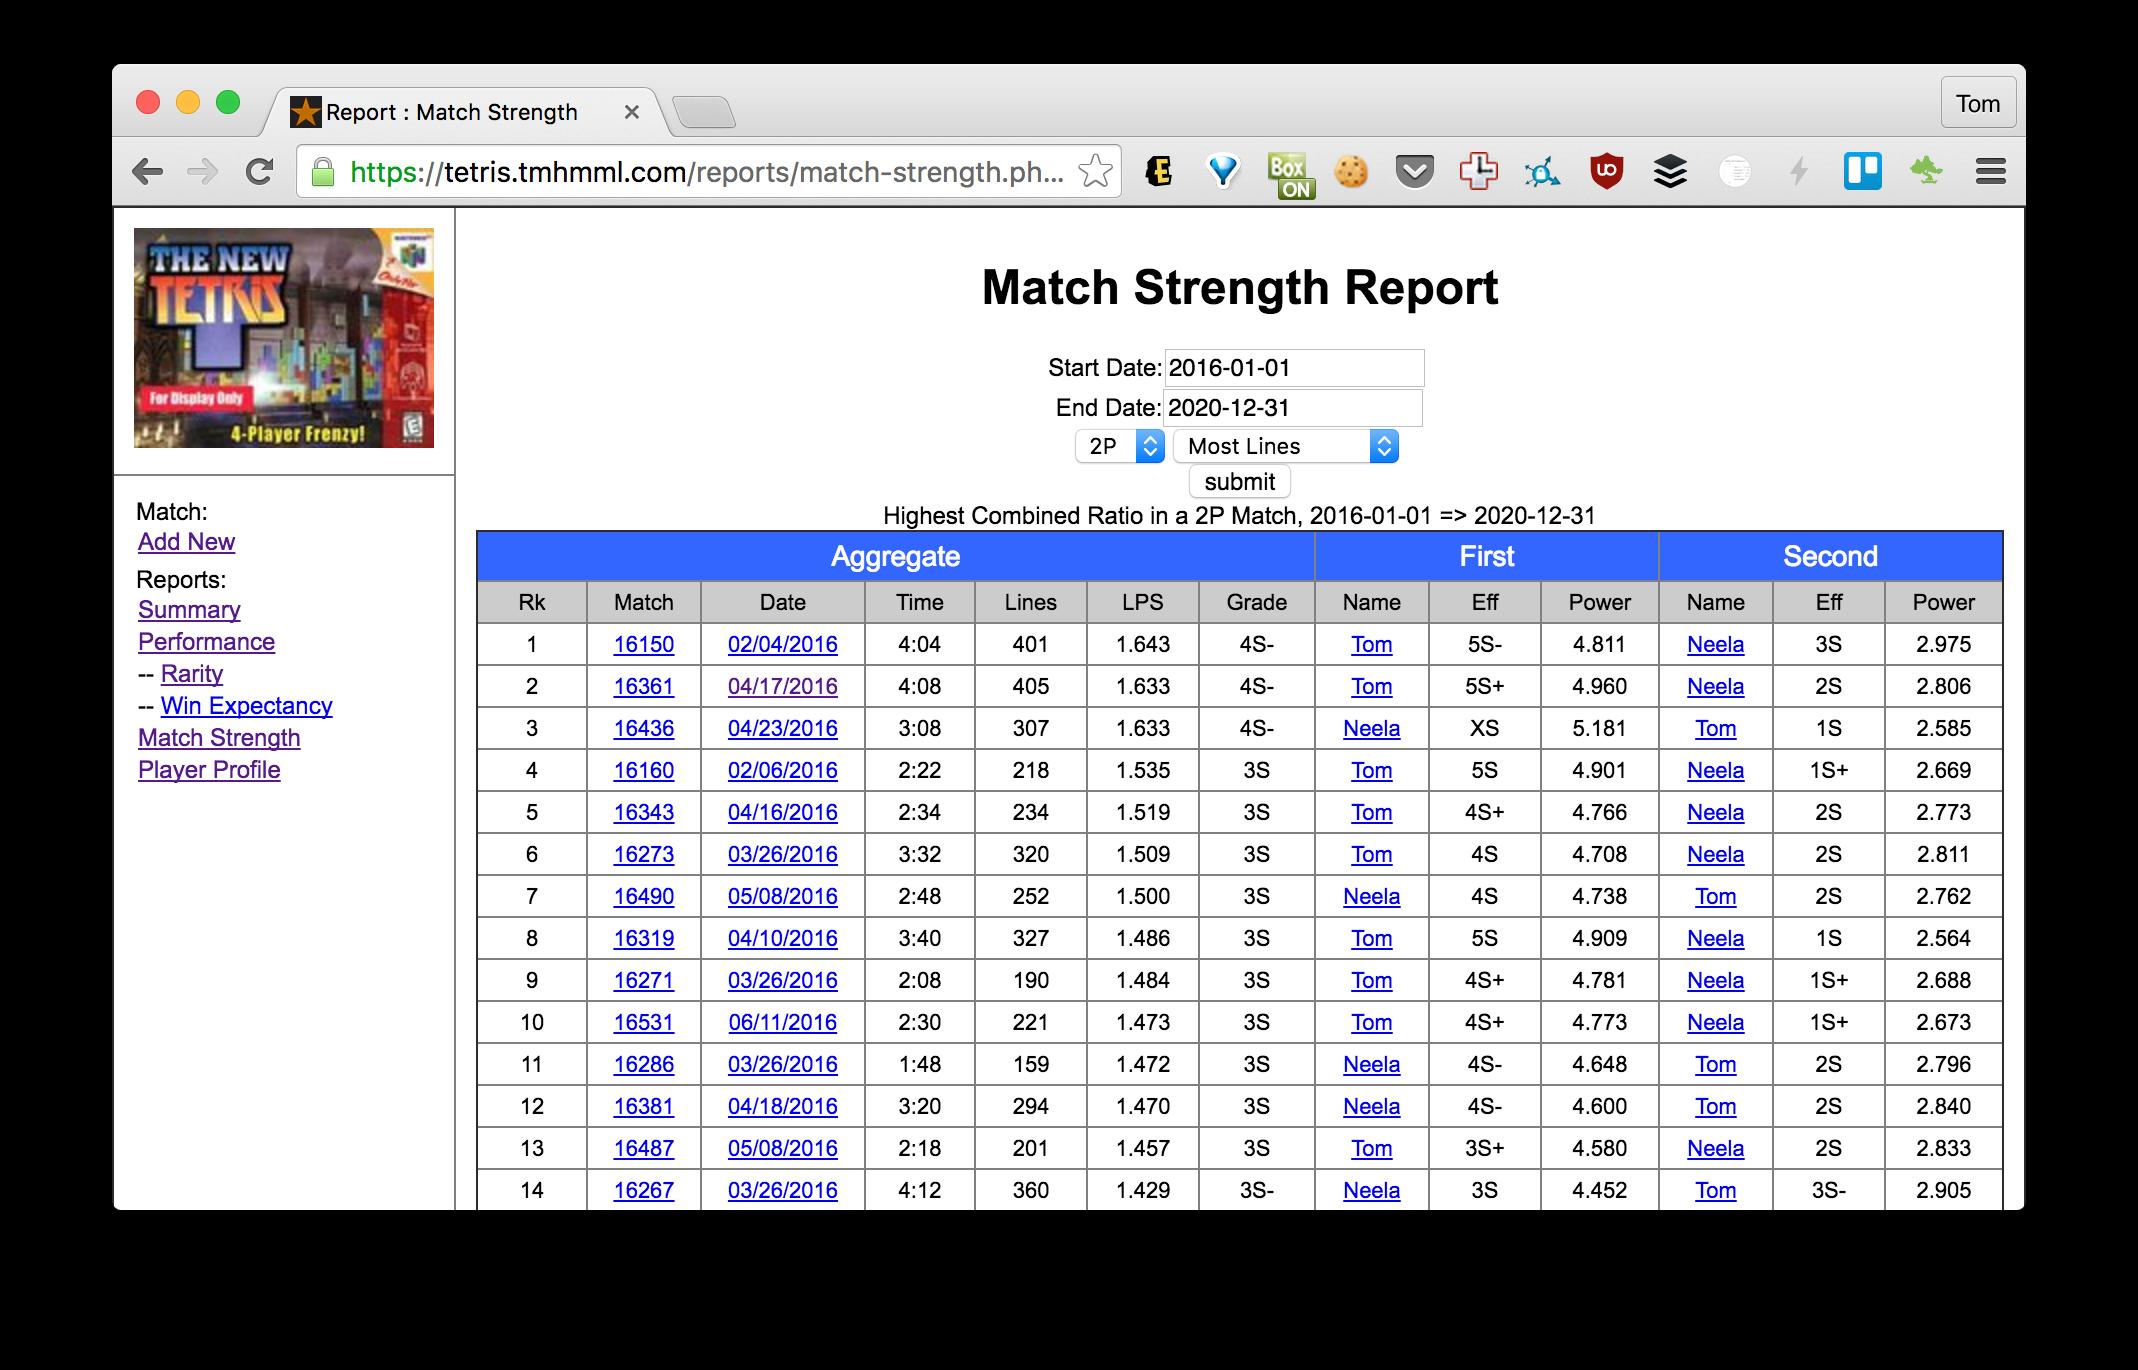 Match Strength report